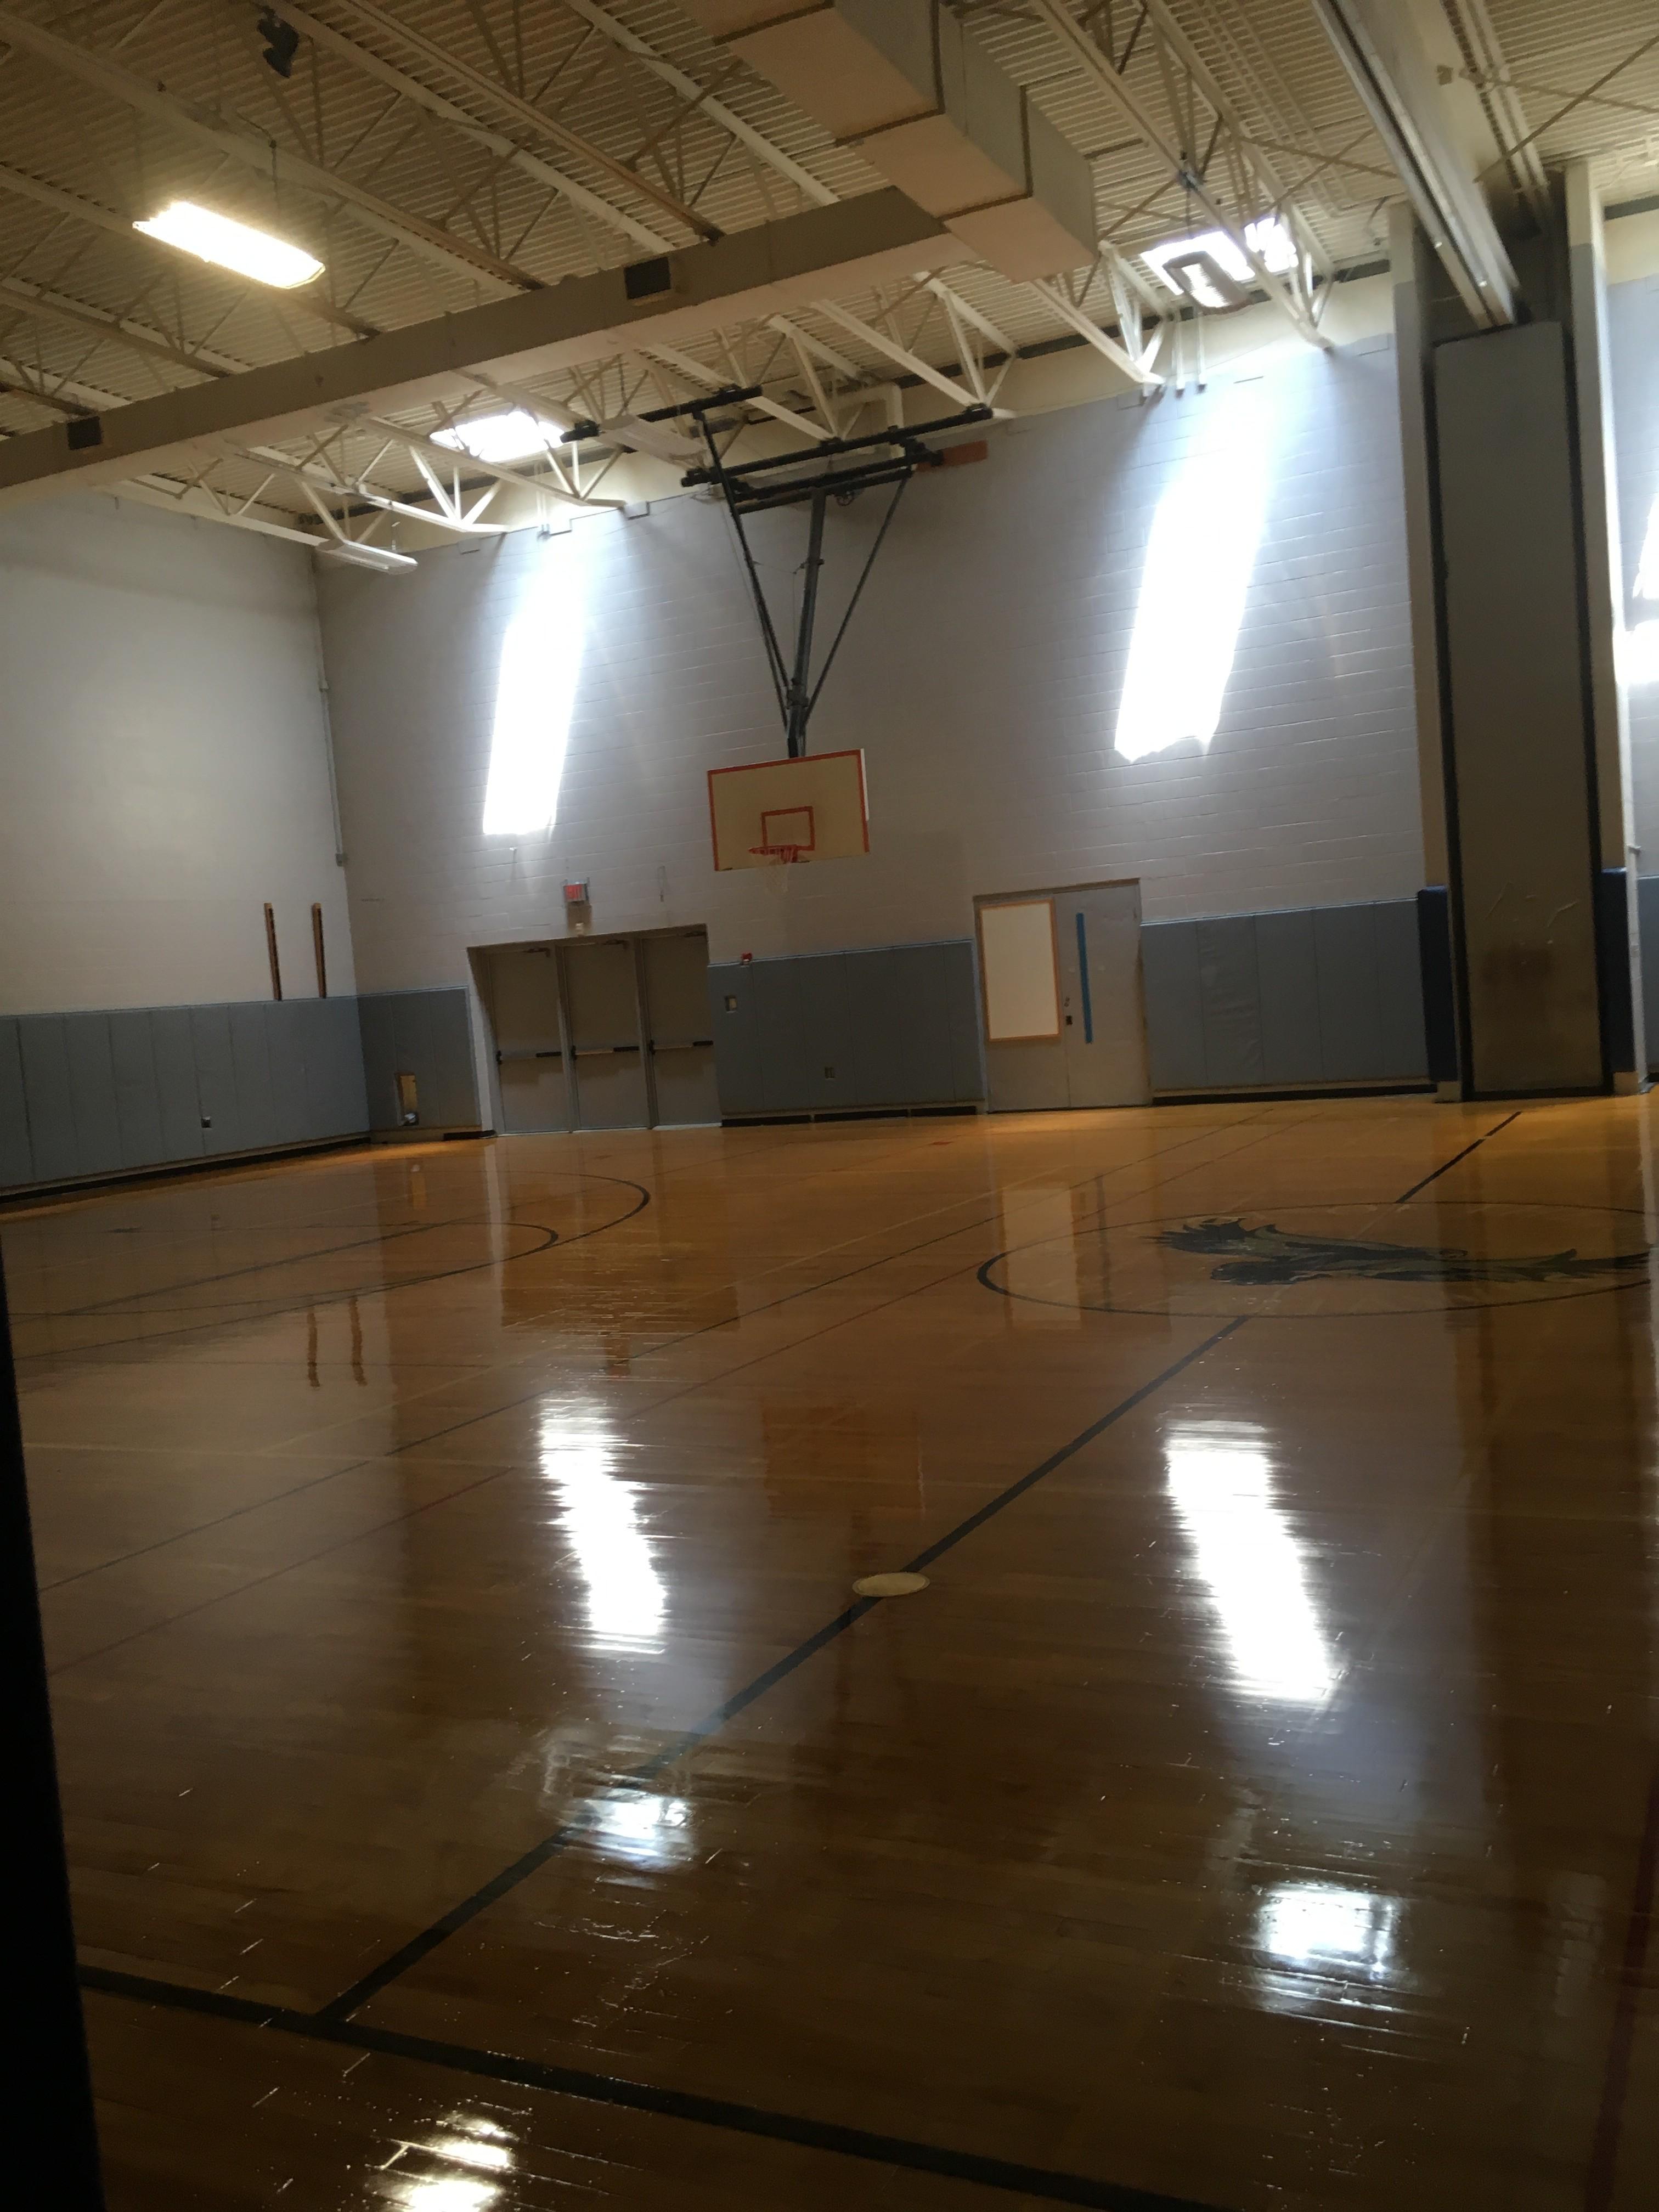 School of the Arts: Gymnasium